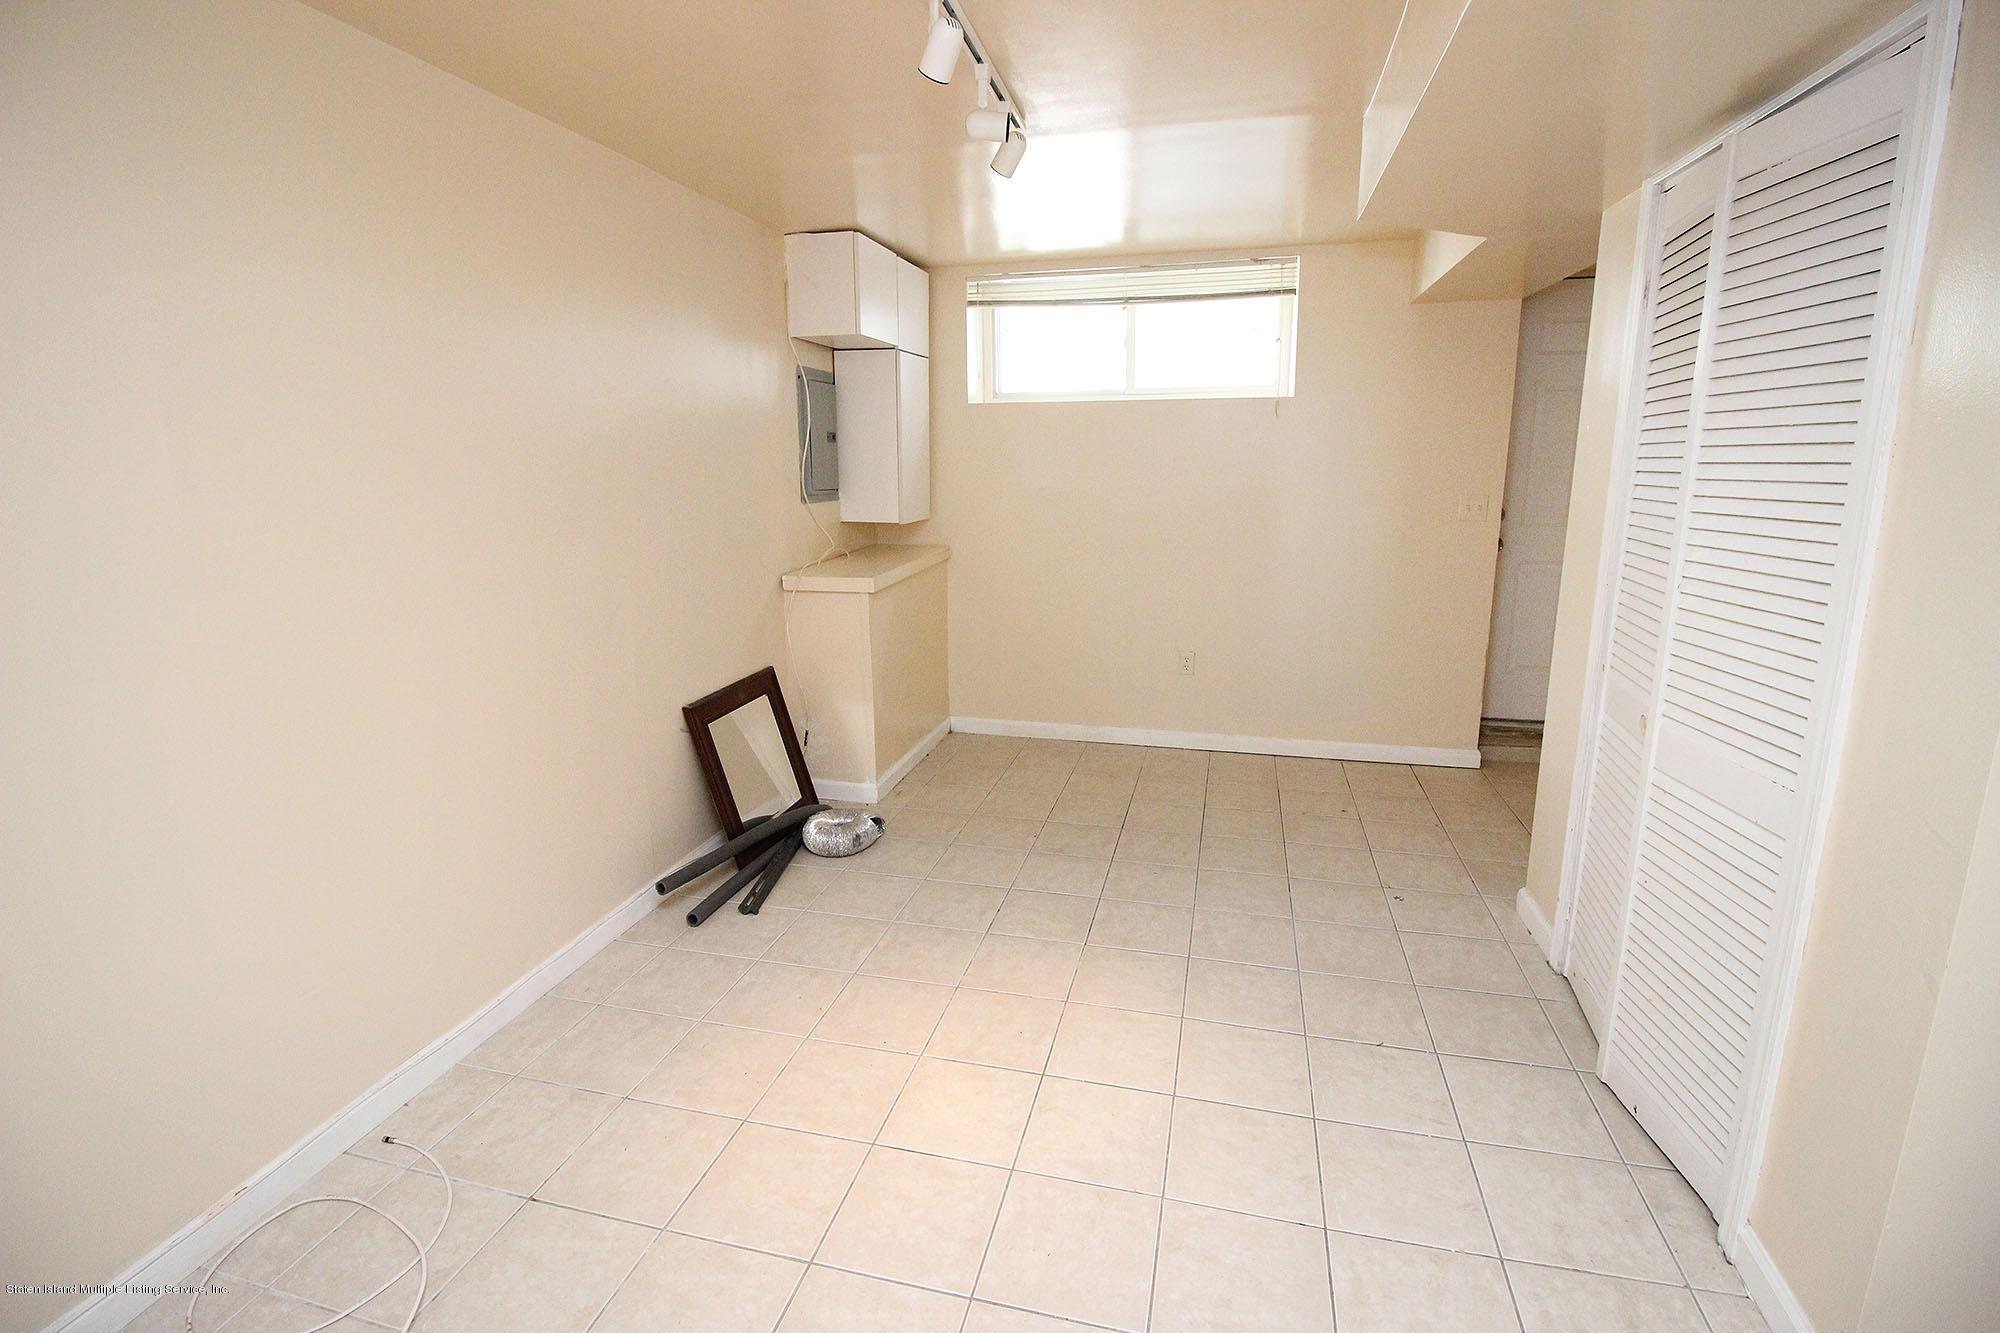 Single Family - Semi-Attached 230 Holden Boulevard  Staten Island, NY 10314, MLS-1139241-14